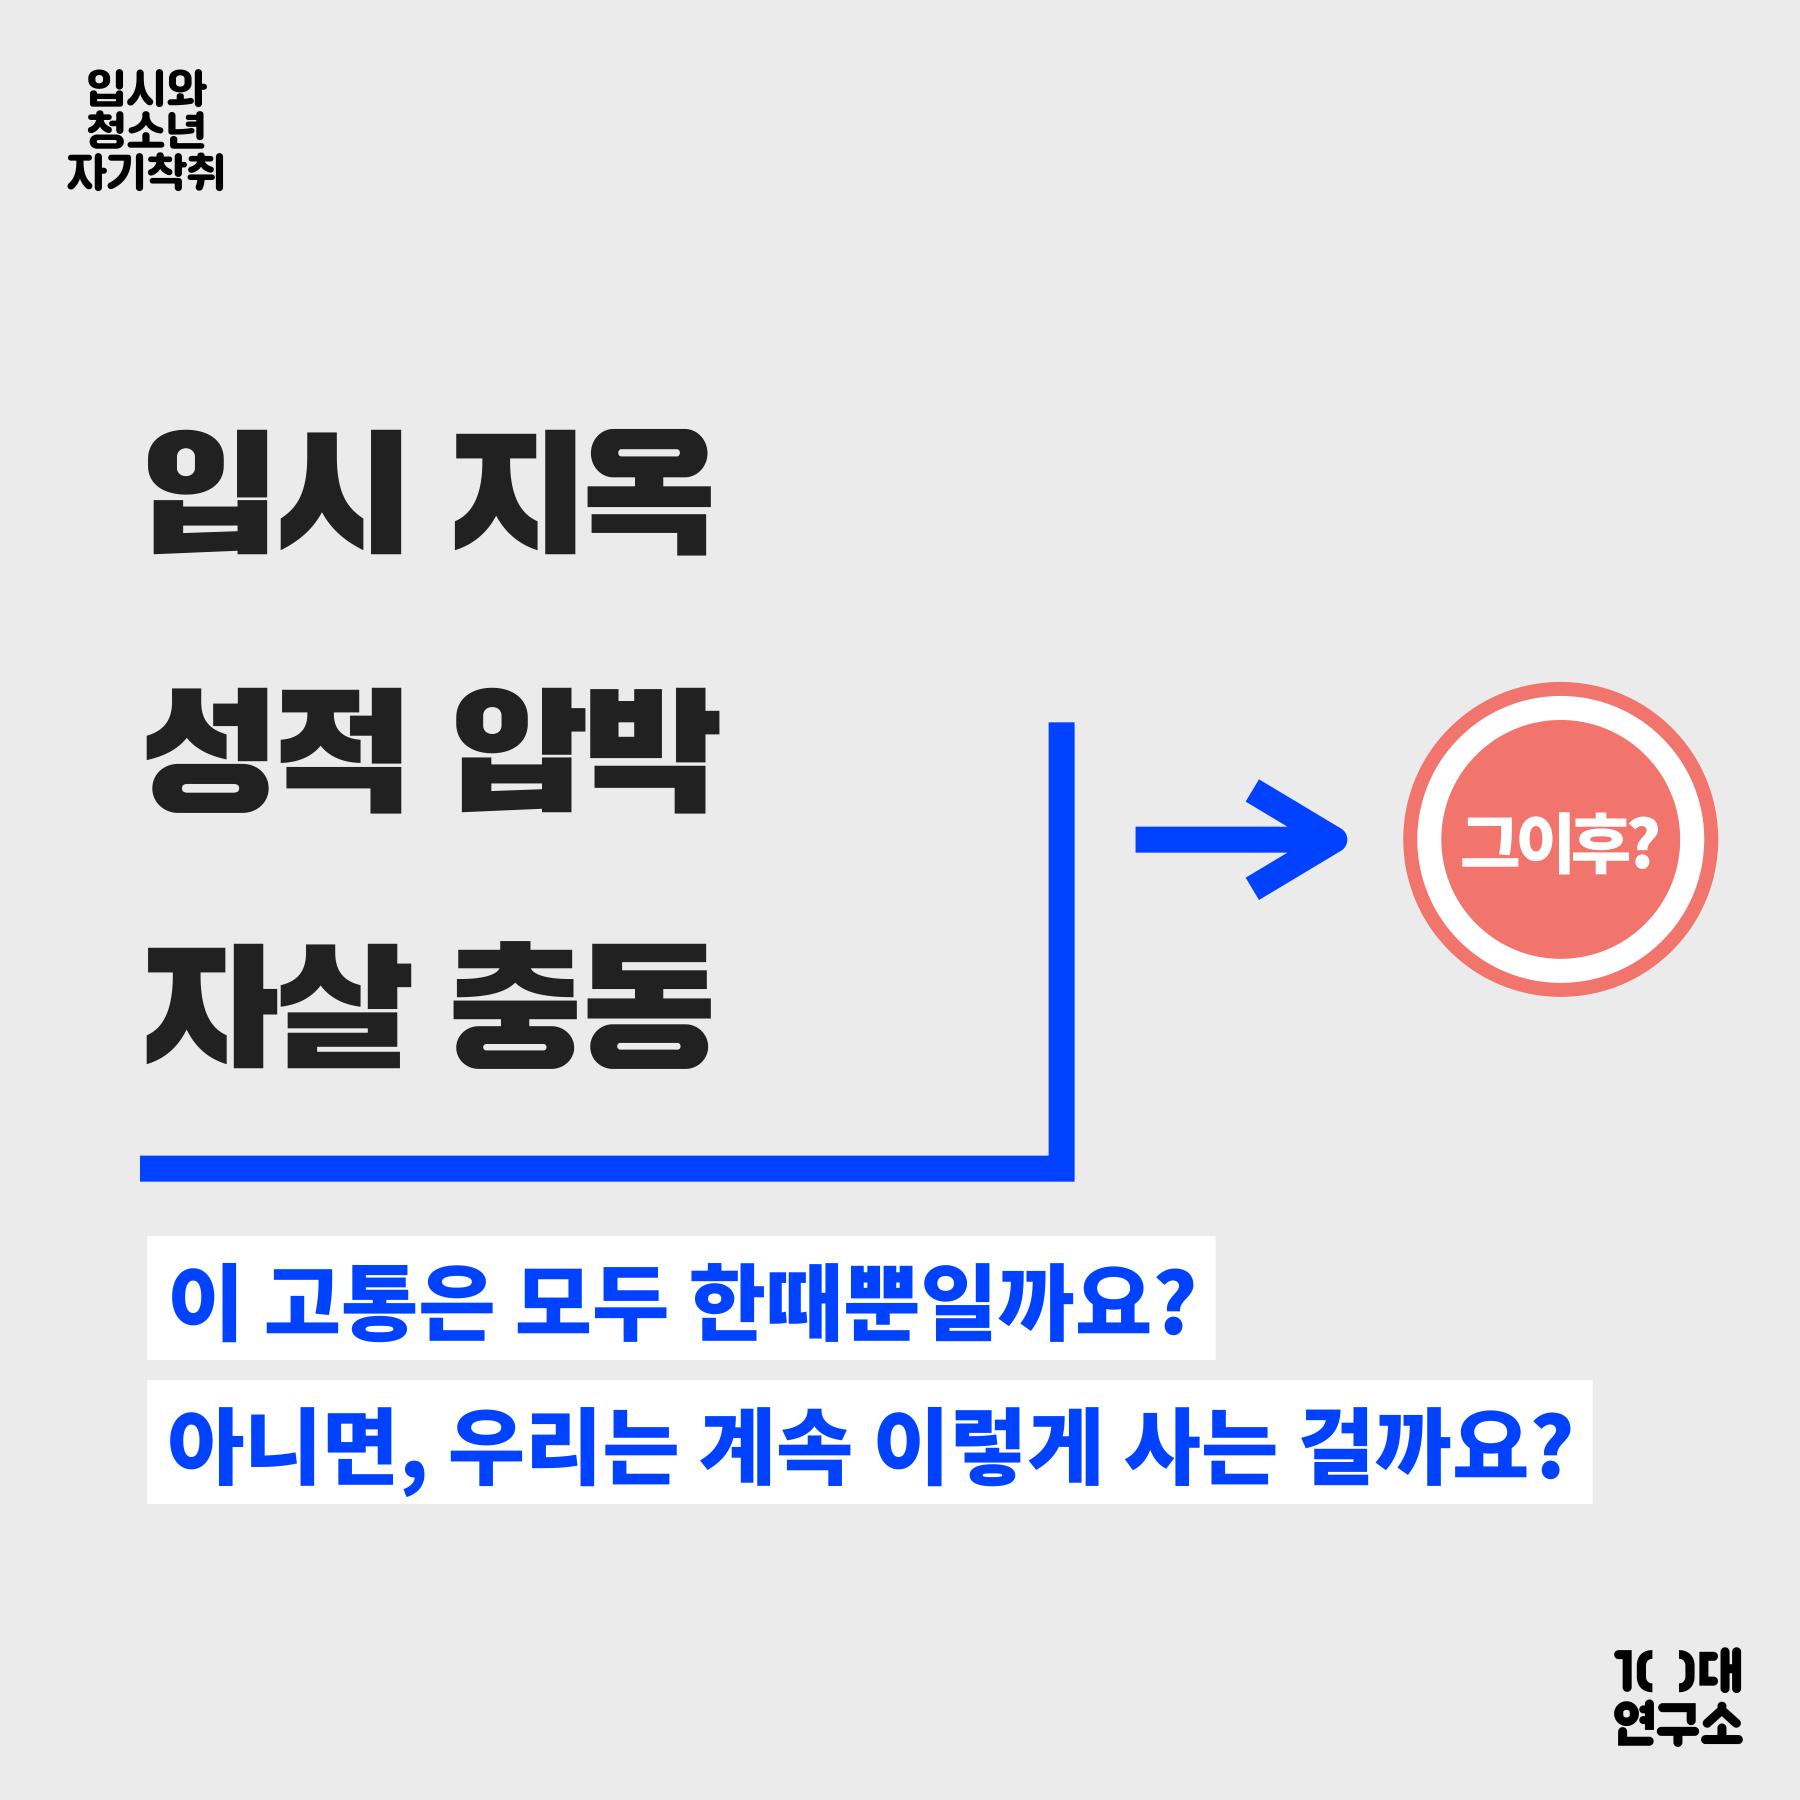 A_입시와 청소년 자기착취_15.png